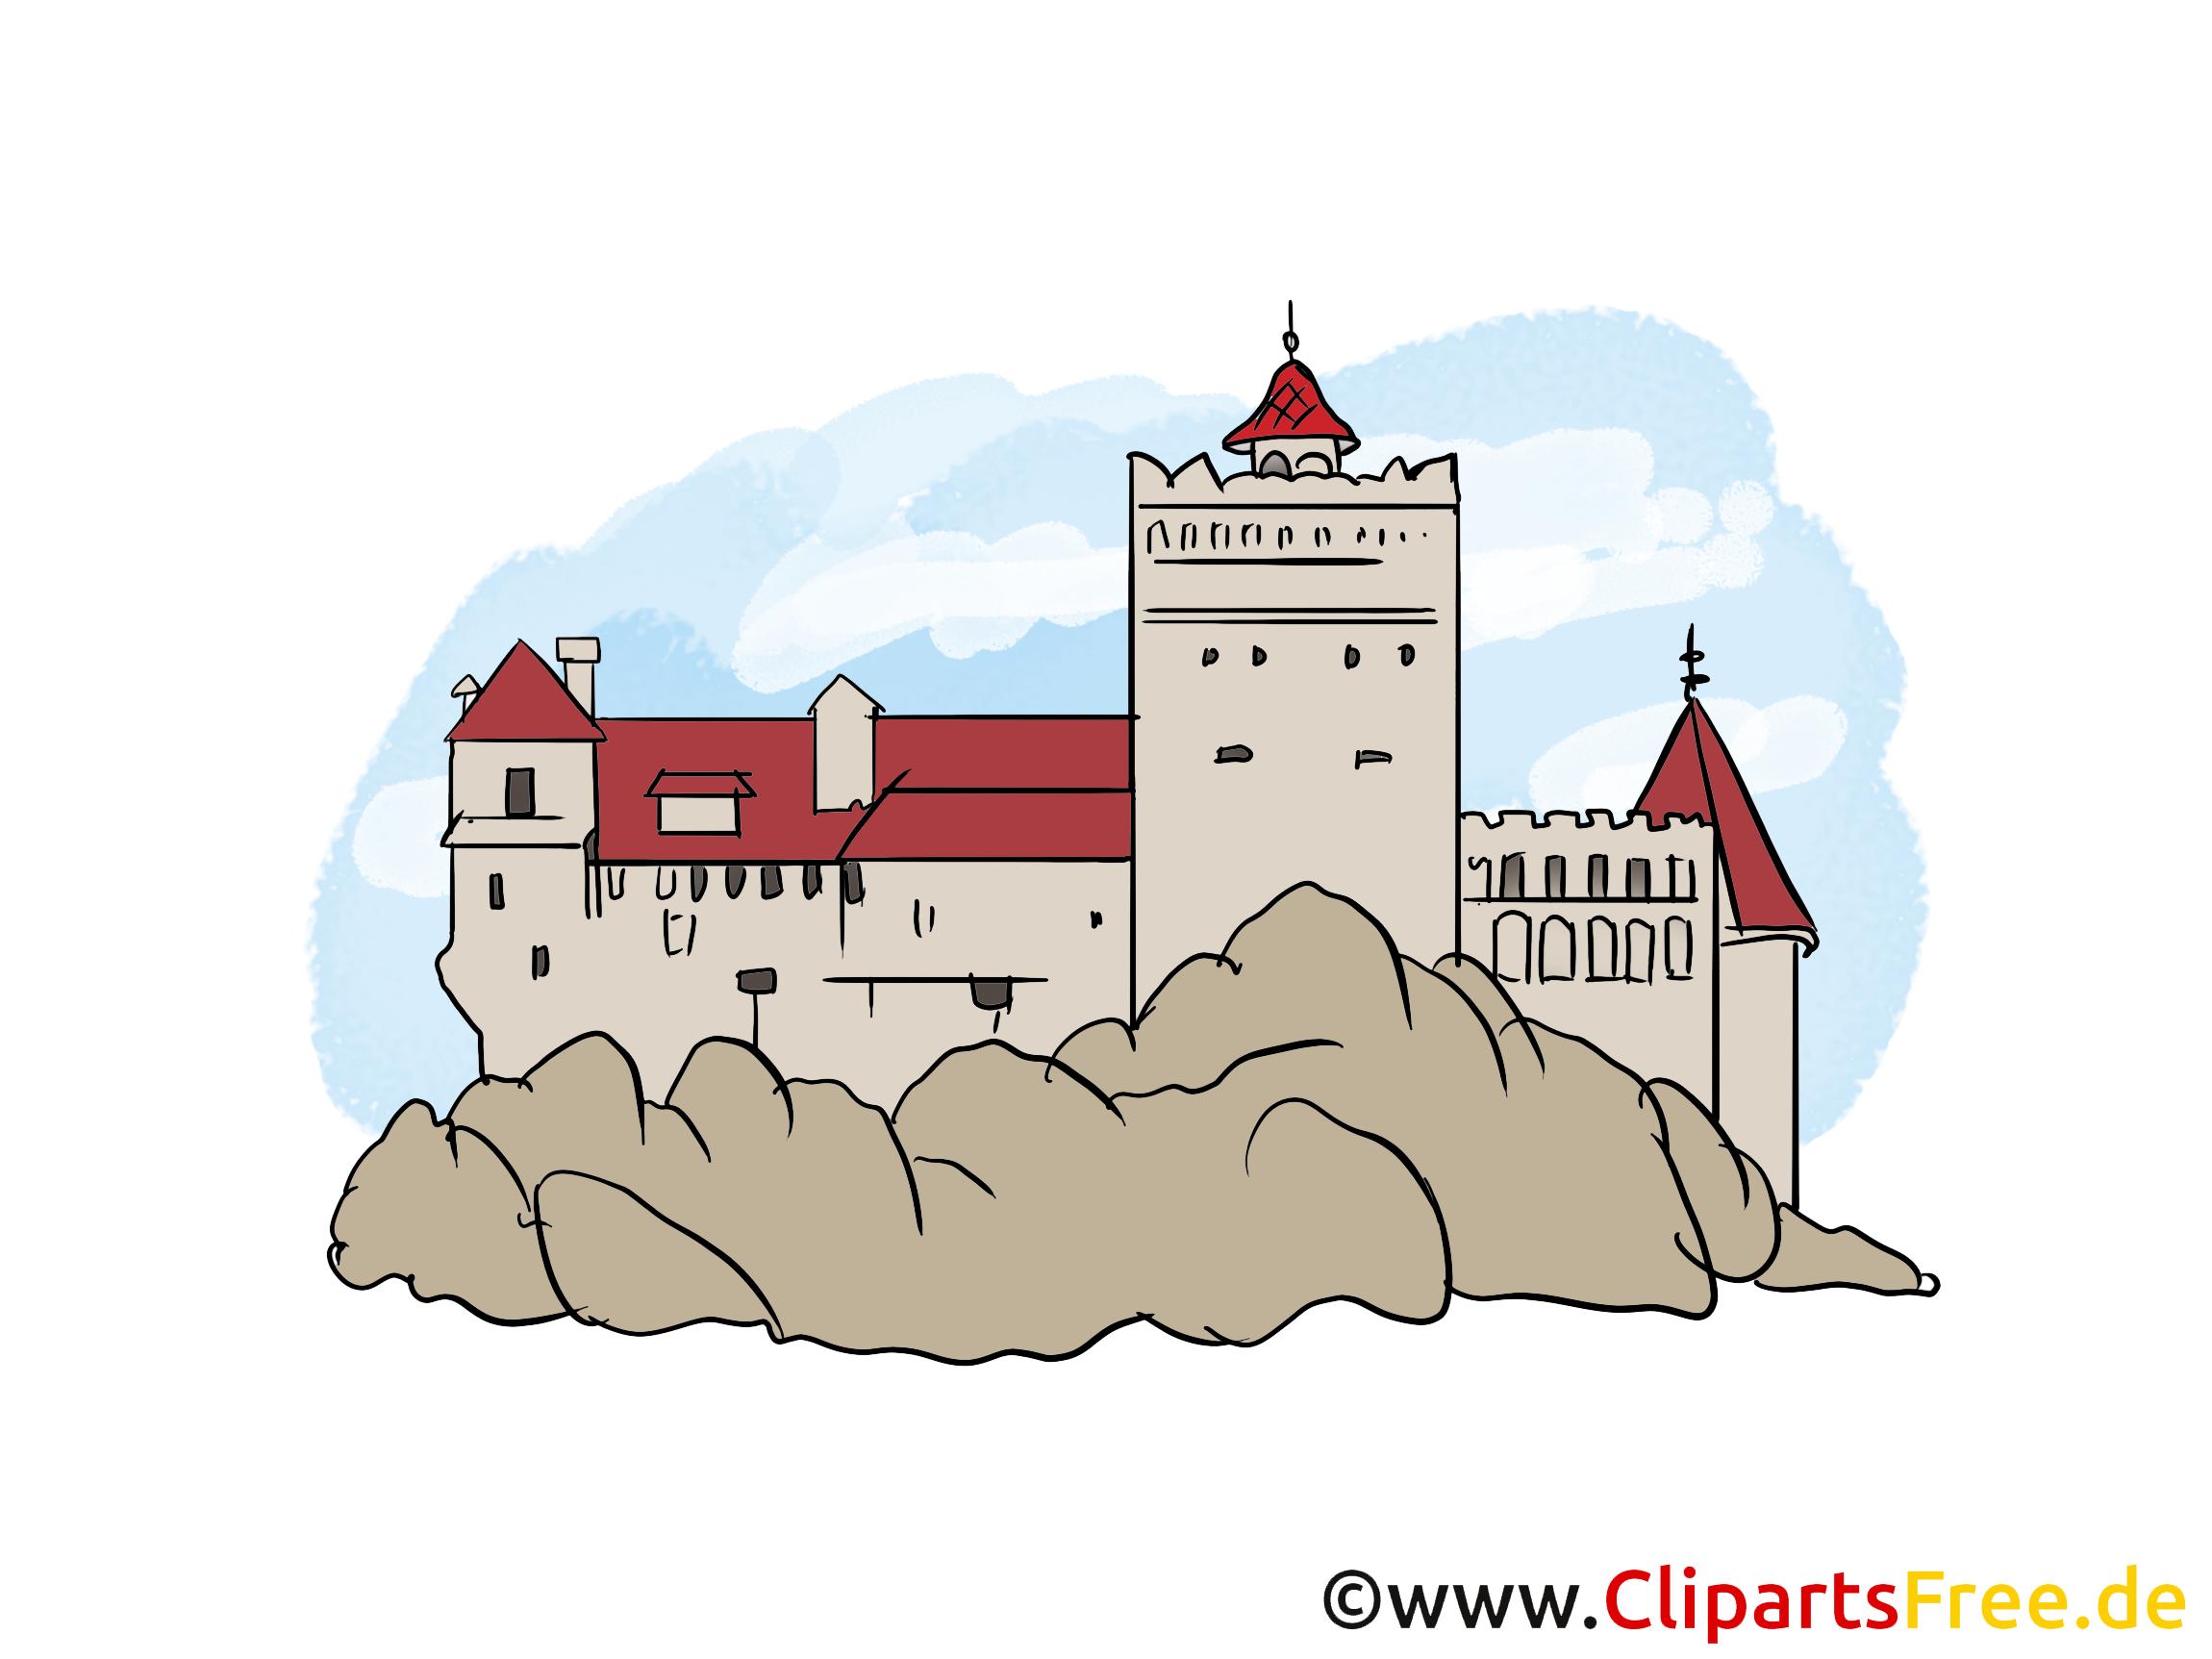 Burg Bild, Clipart, Illustration, Grafikm gratis